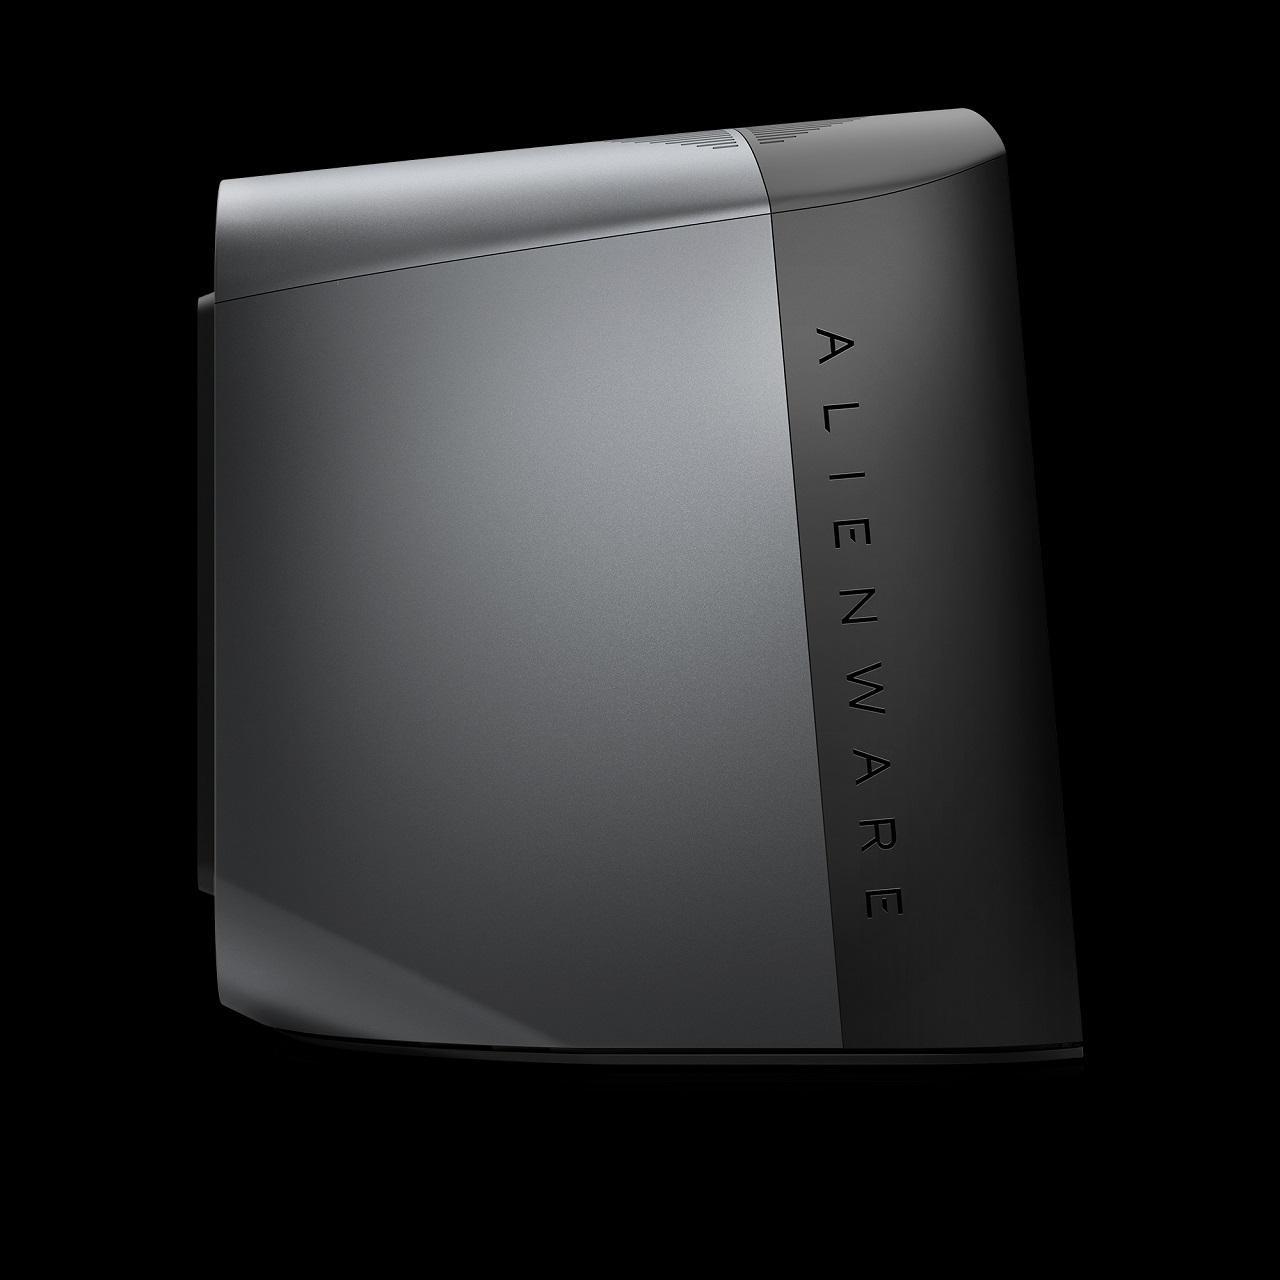 Dell has unveiled the Alienware Aurora R9 desktop at Gamescom 2019 6